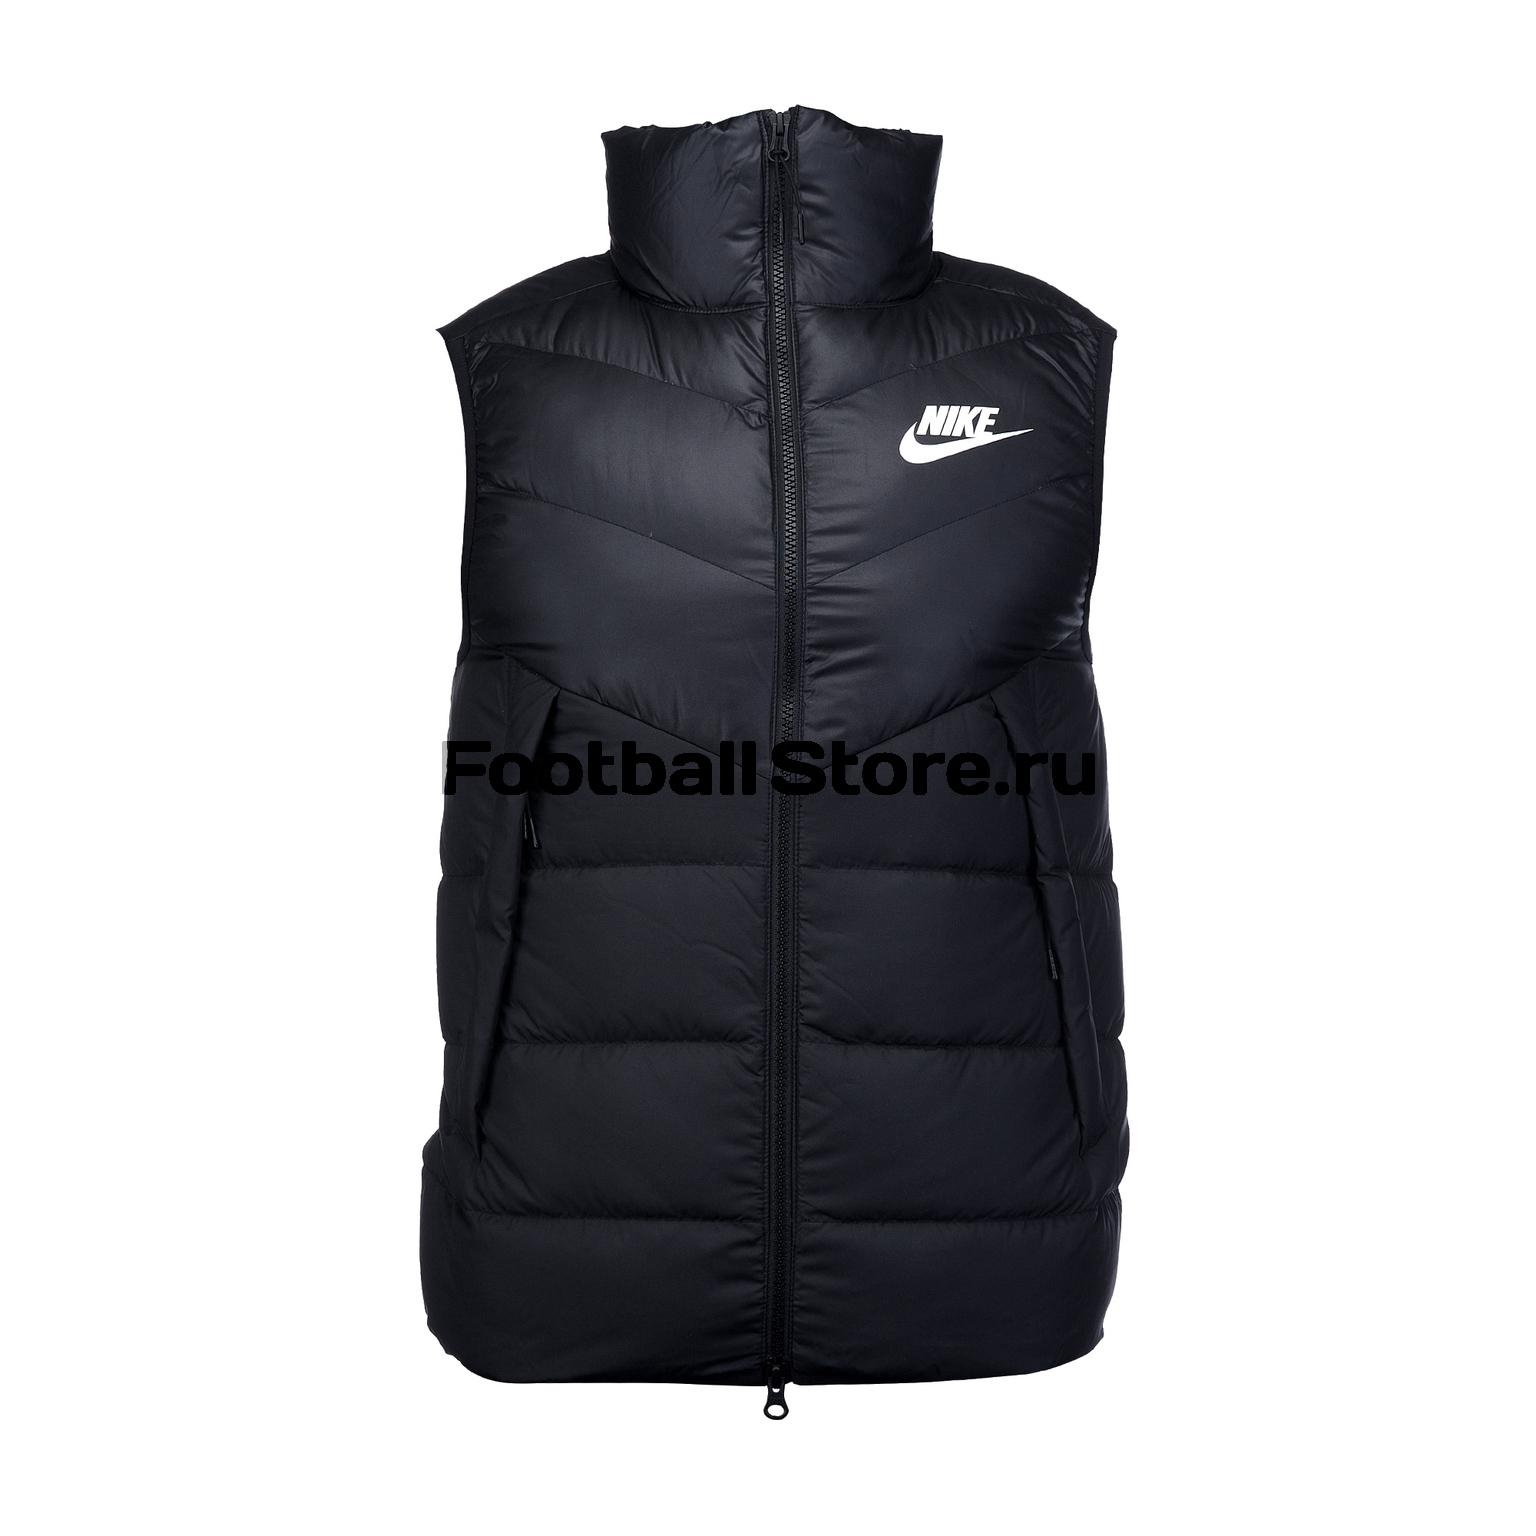 Жилет Nike Down Fill Vest 928859-010 пуховый жилет adidas w53326 w53321